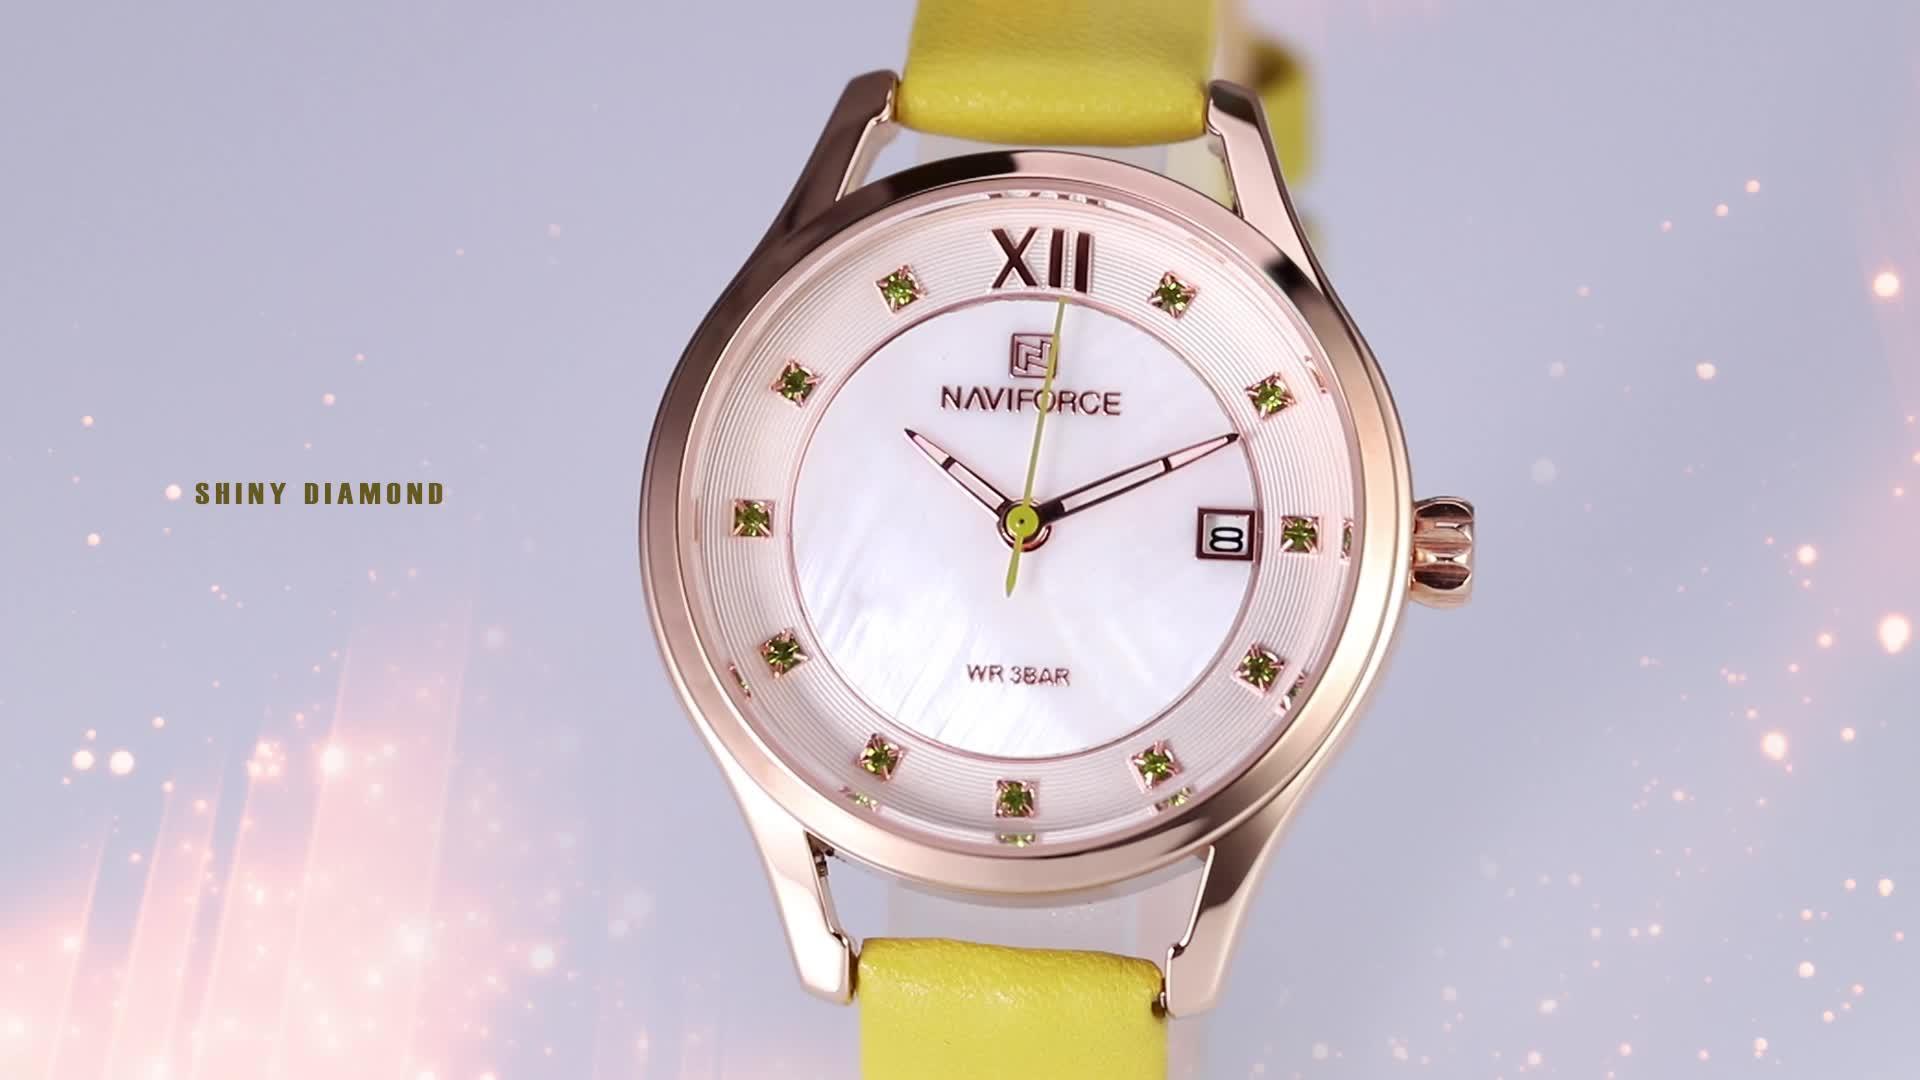 navi force watch 5010 top Brand casual relojes de mujer montre jam tangan women watches naviforce